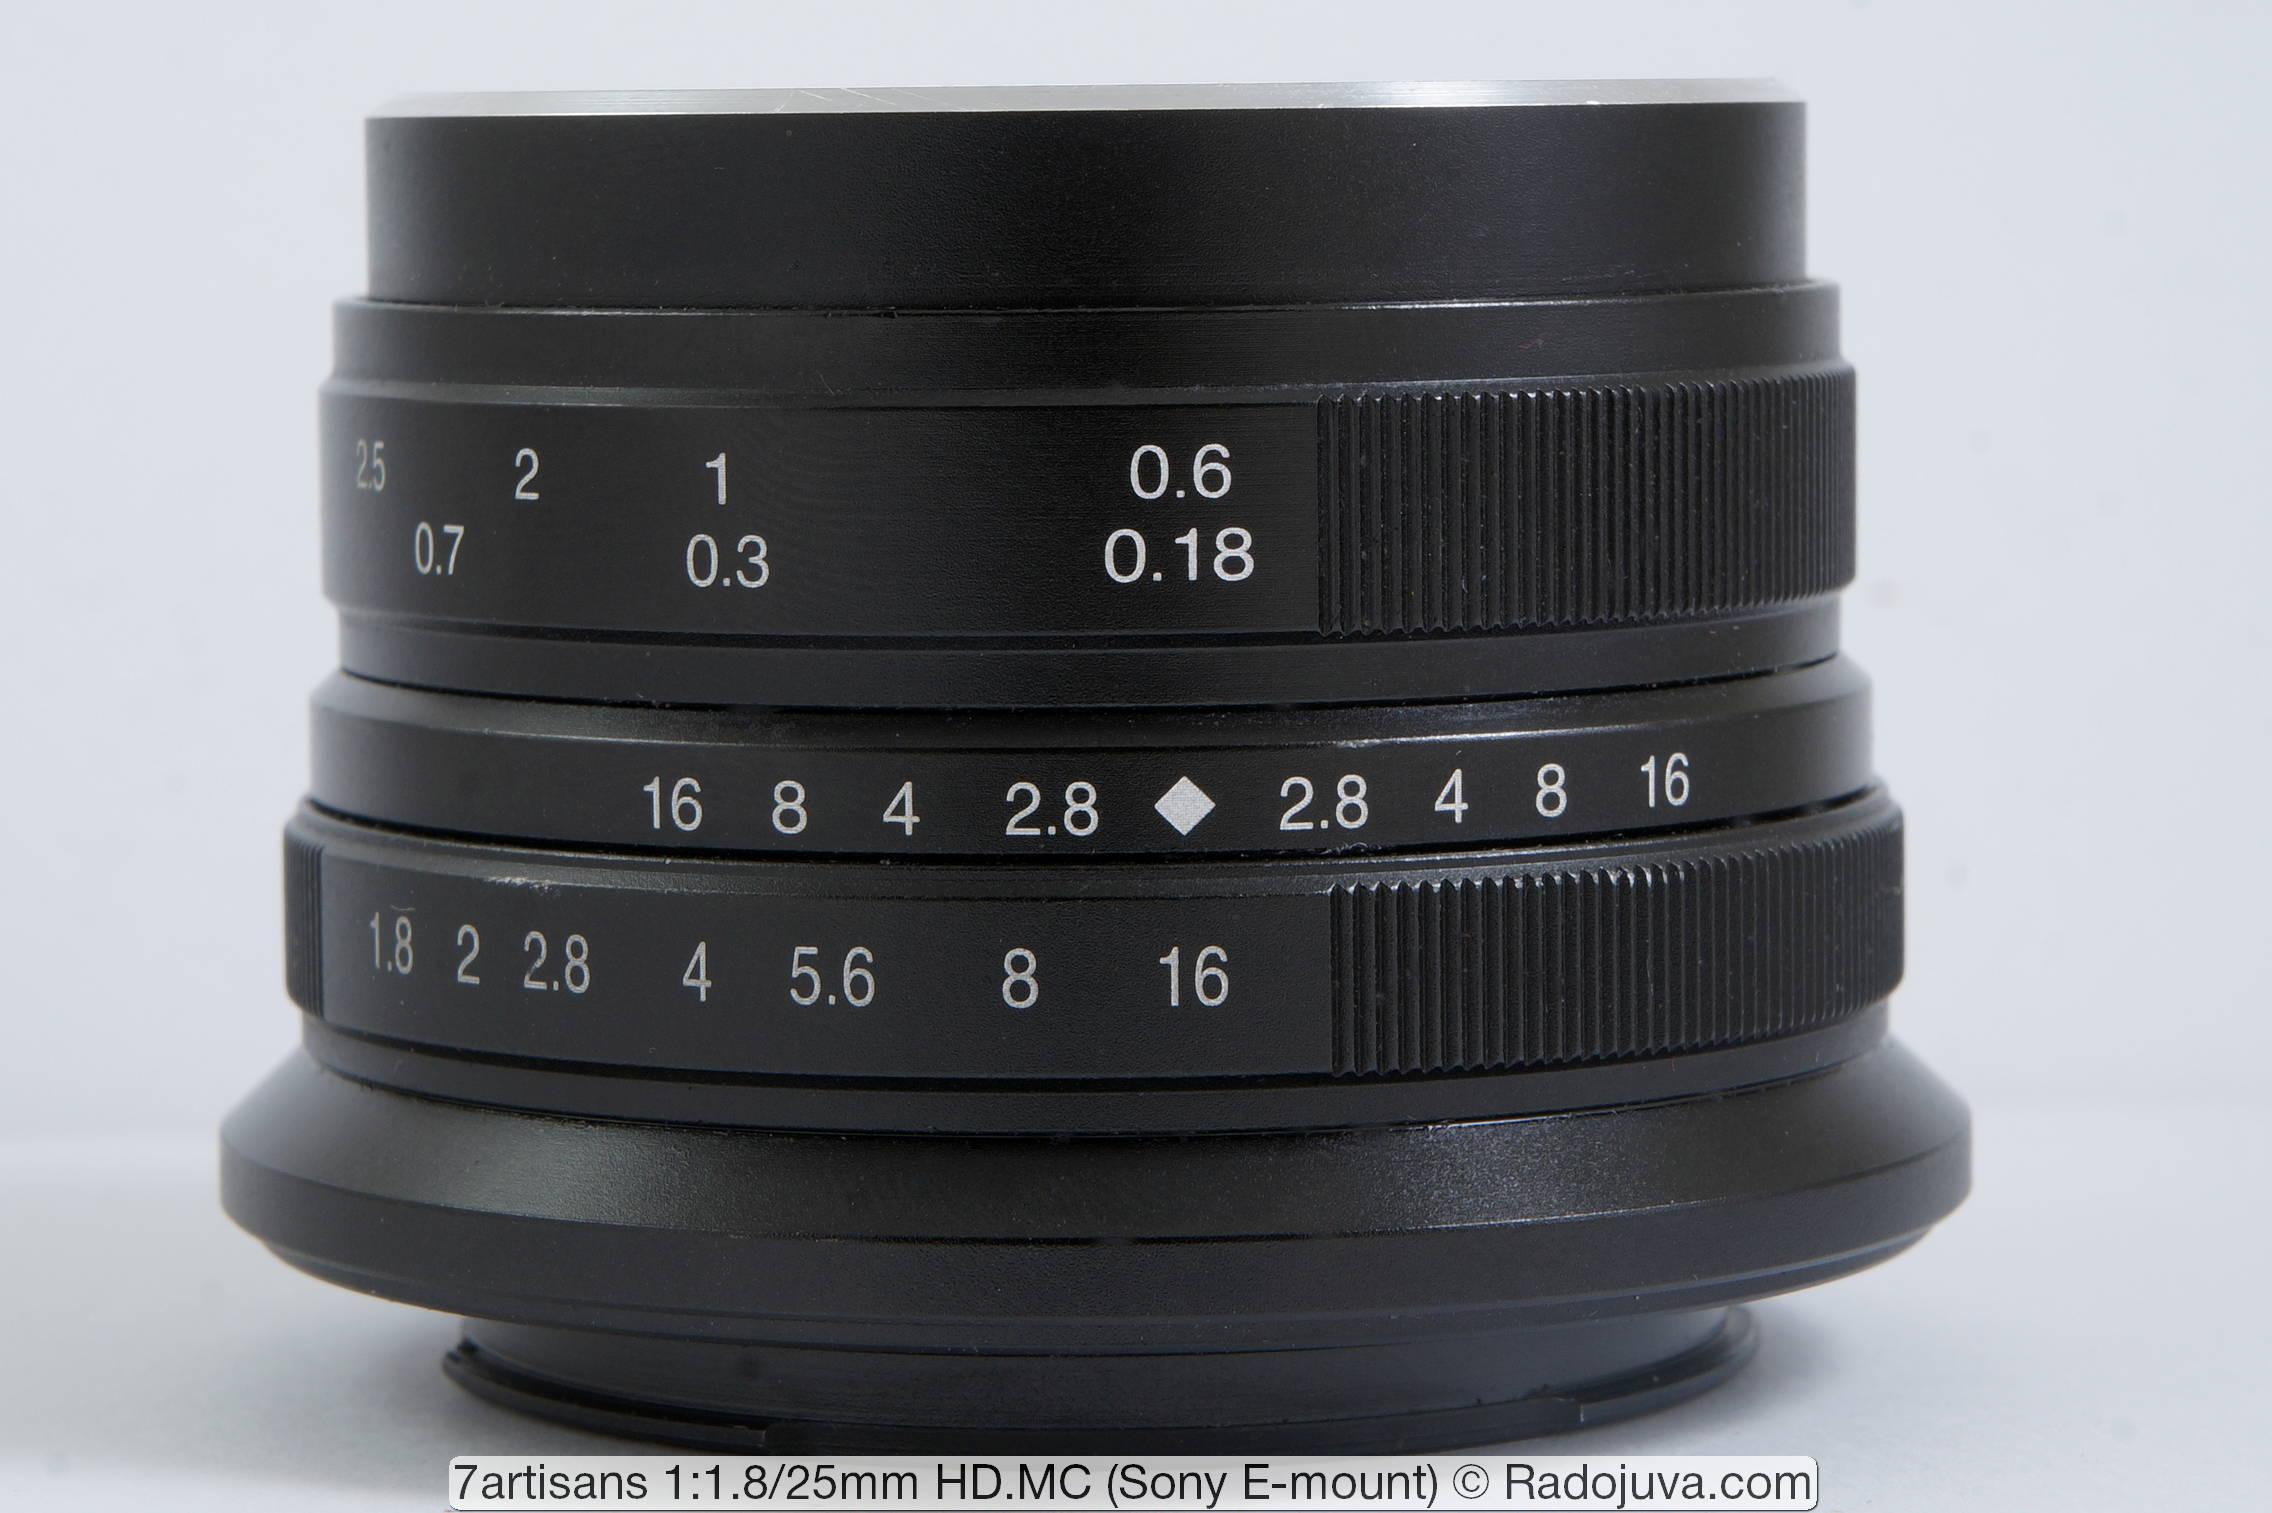 7Artisans 1:1.8/25mm HD.MC